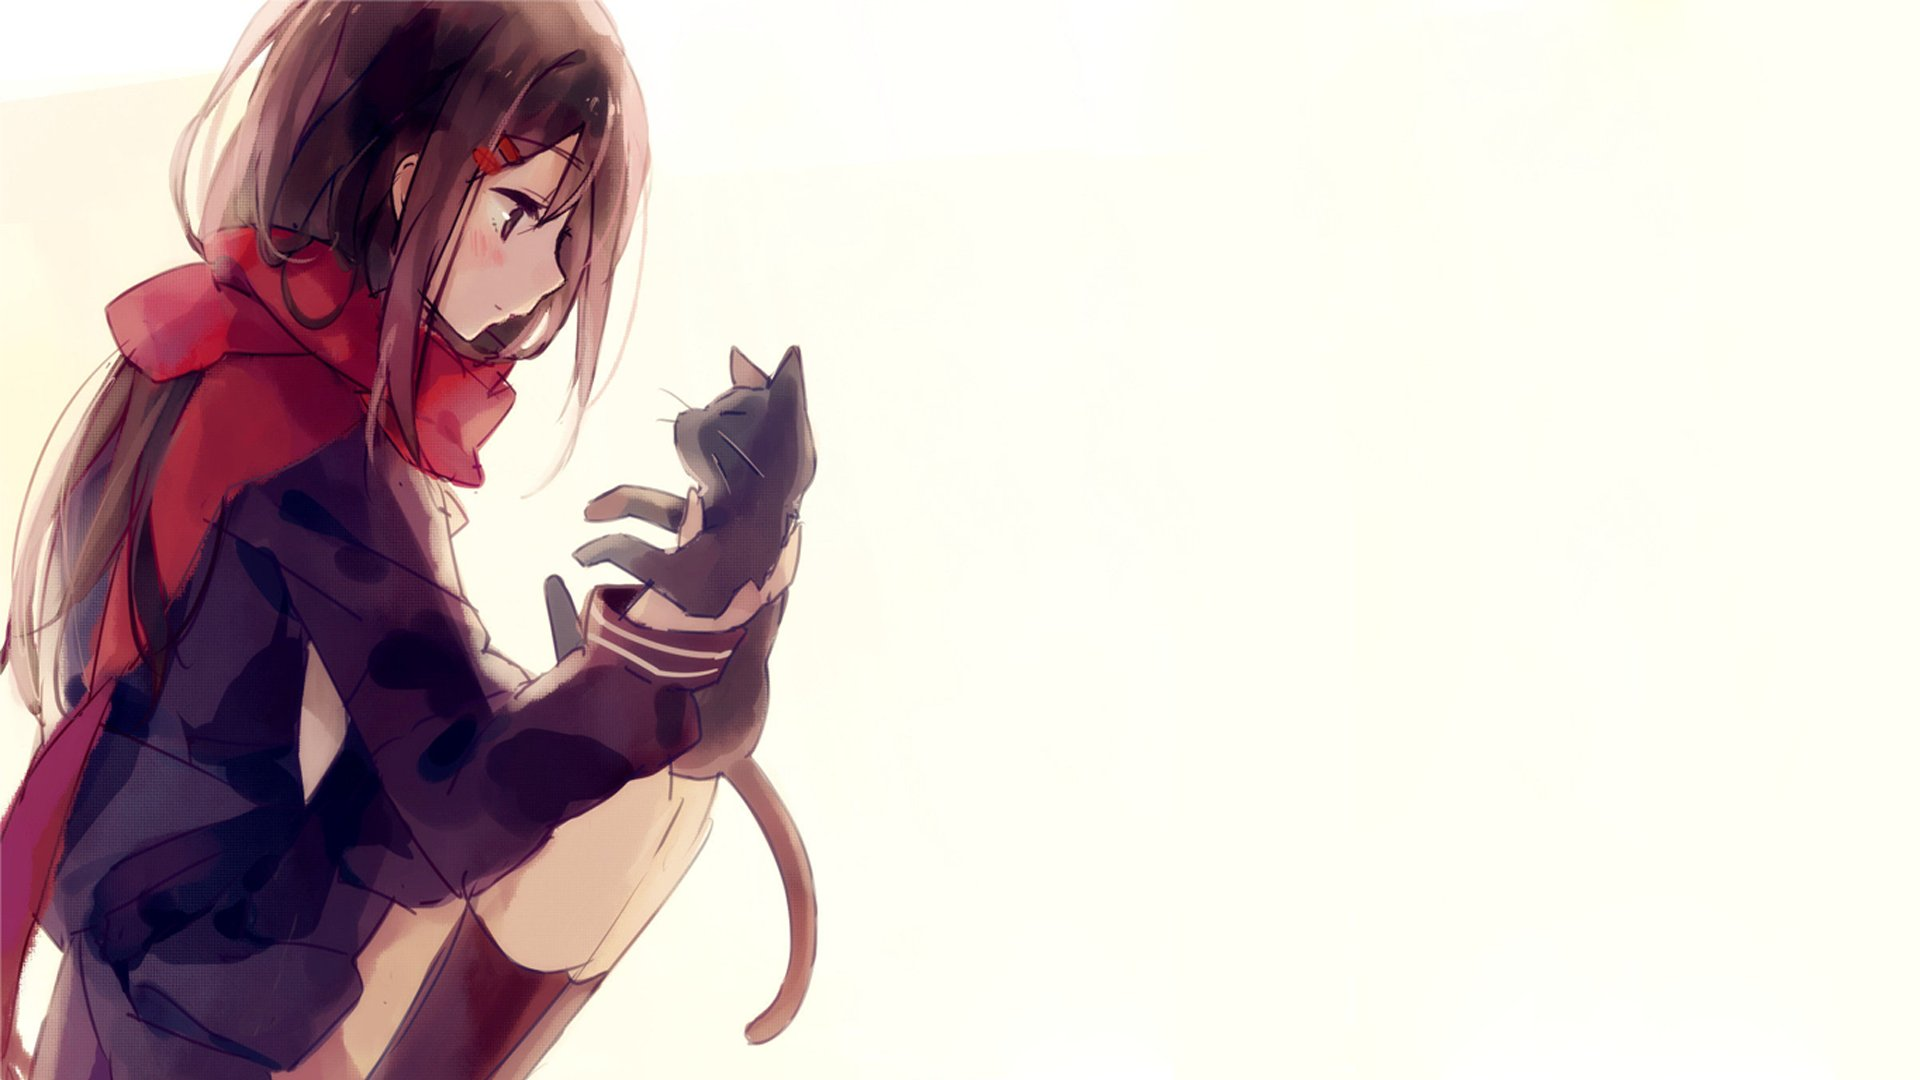 Kagerou project anime series girl cute cat wallpaper 1920x1080 798430 wallpaperup